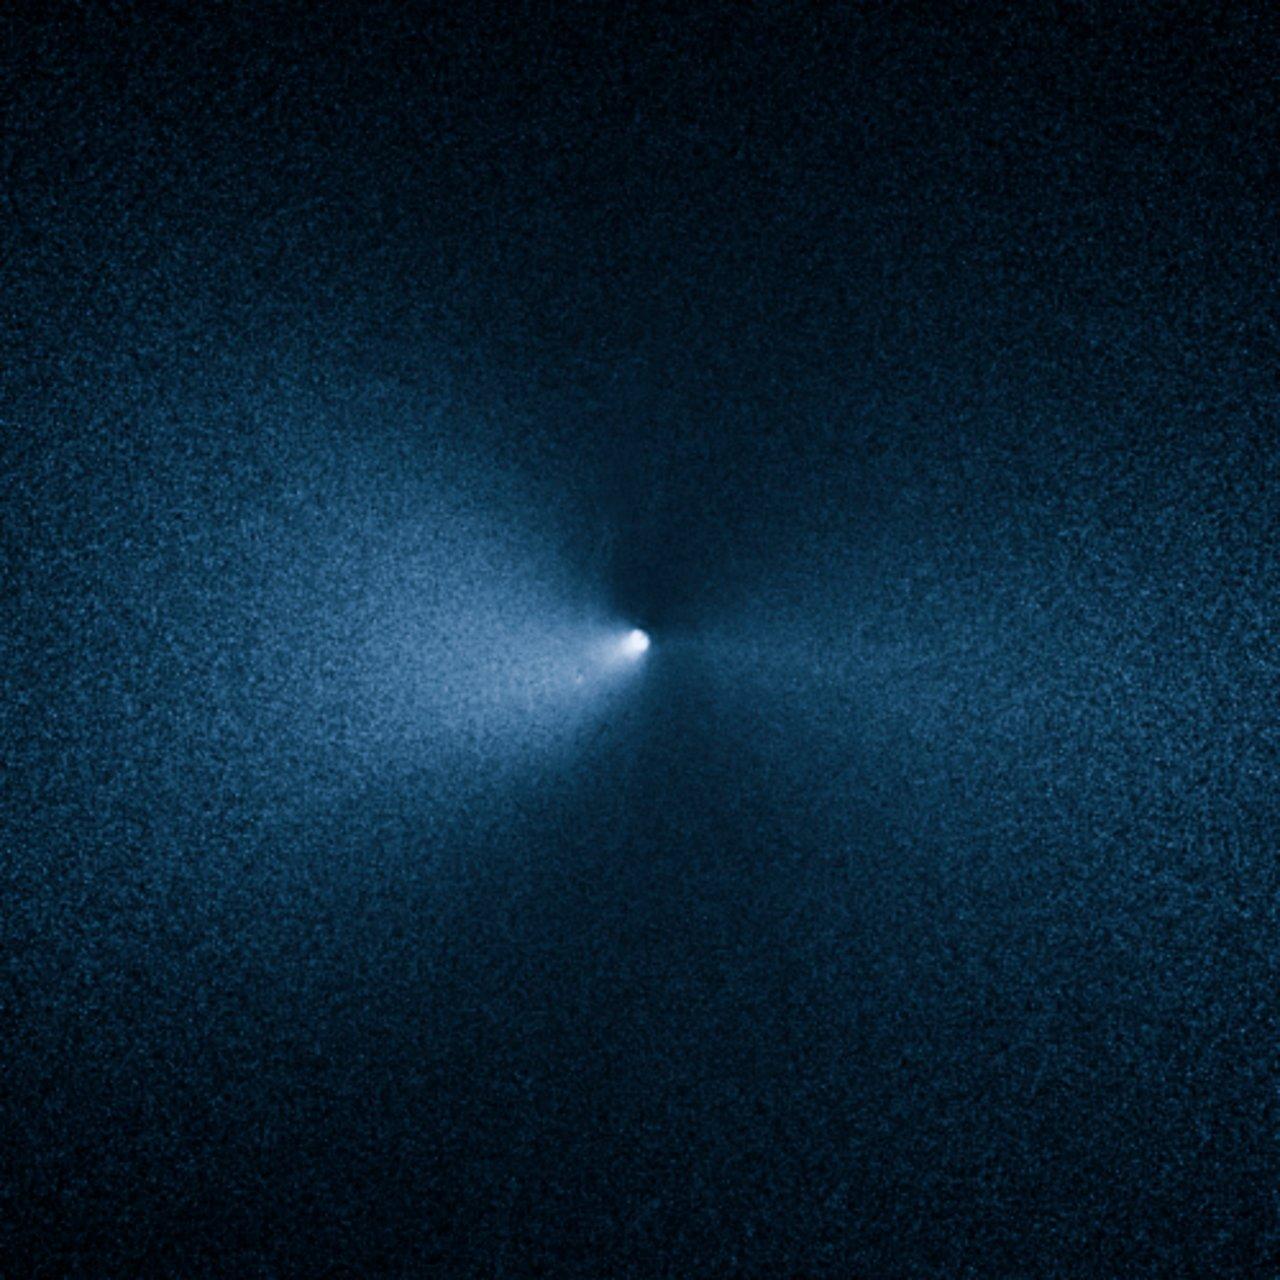 Comet 252P/LINEAR